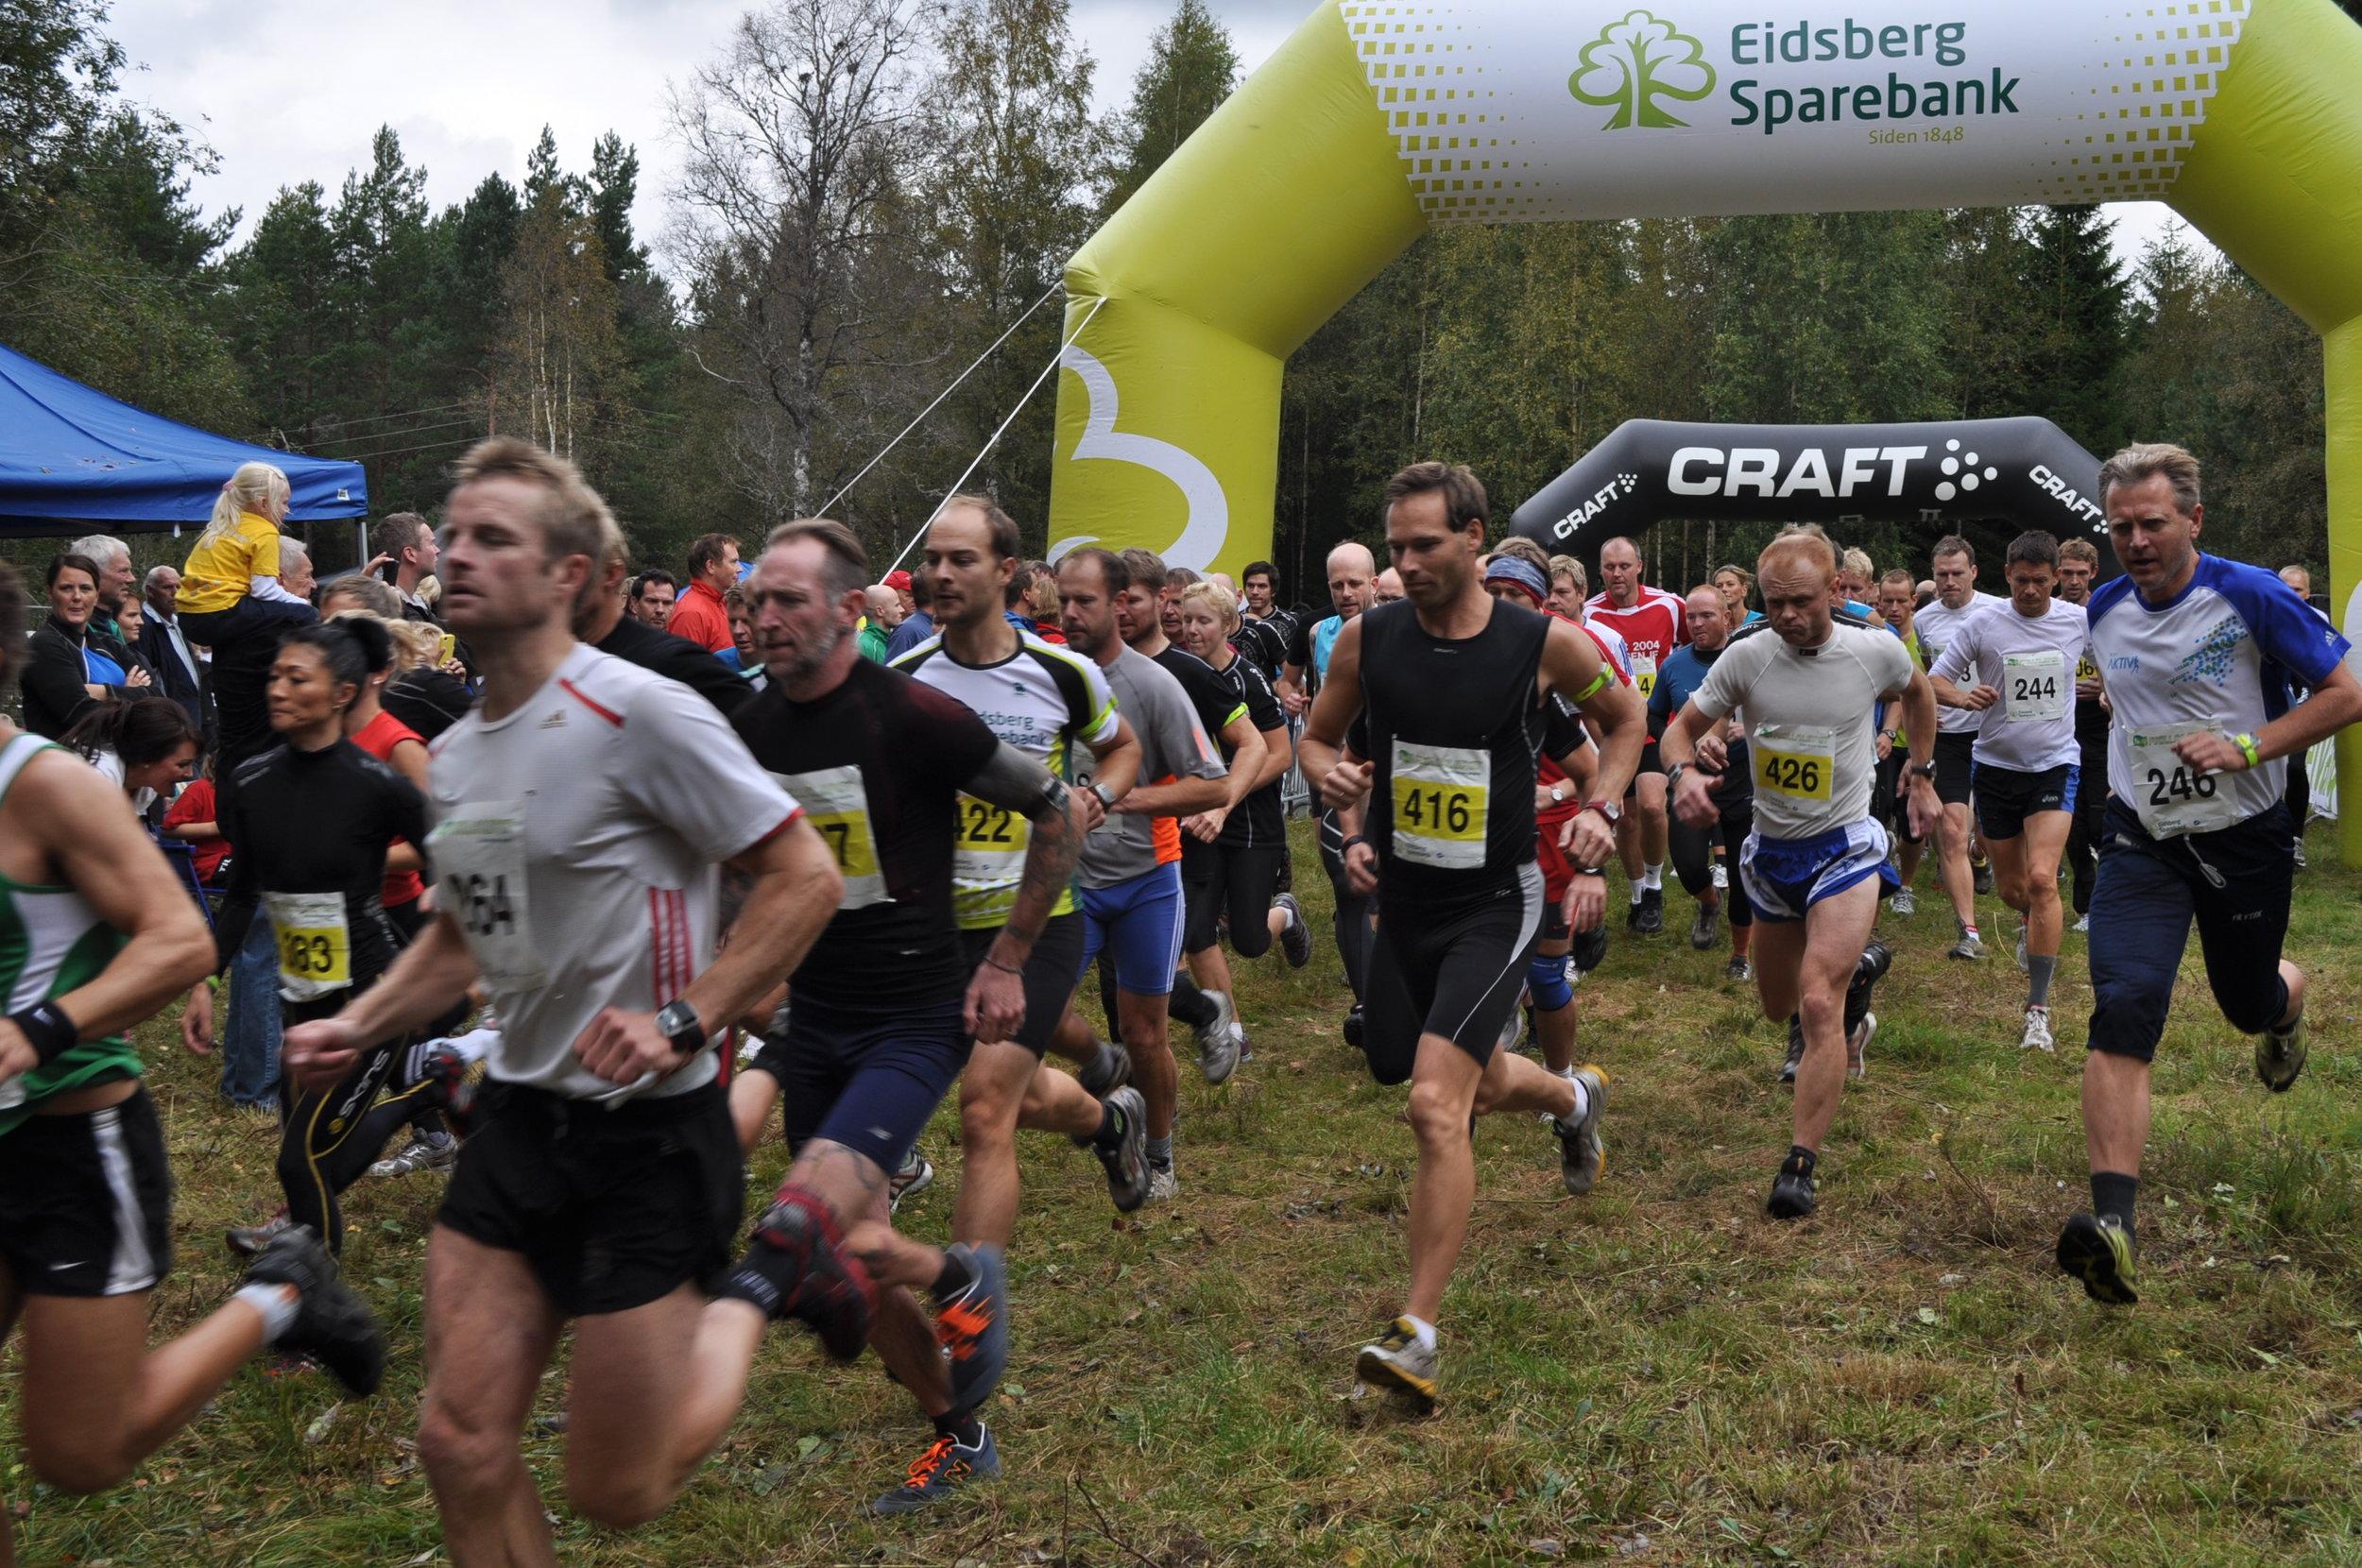 10 km rekorder: - Damer: Anni-Maija FinckeTid: 43:02 (2016)Herrer: Mattias Karlssonid: 37:07 (2014)